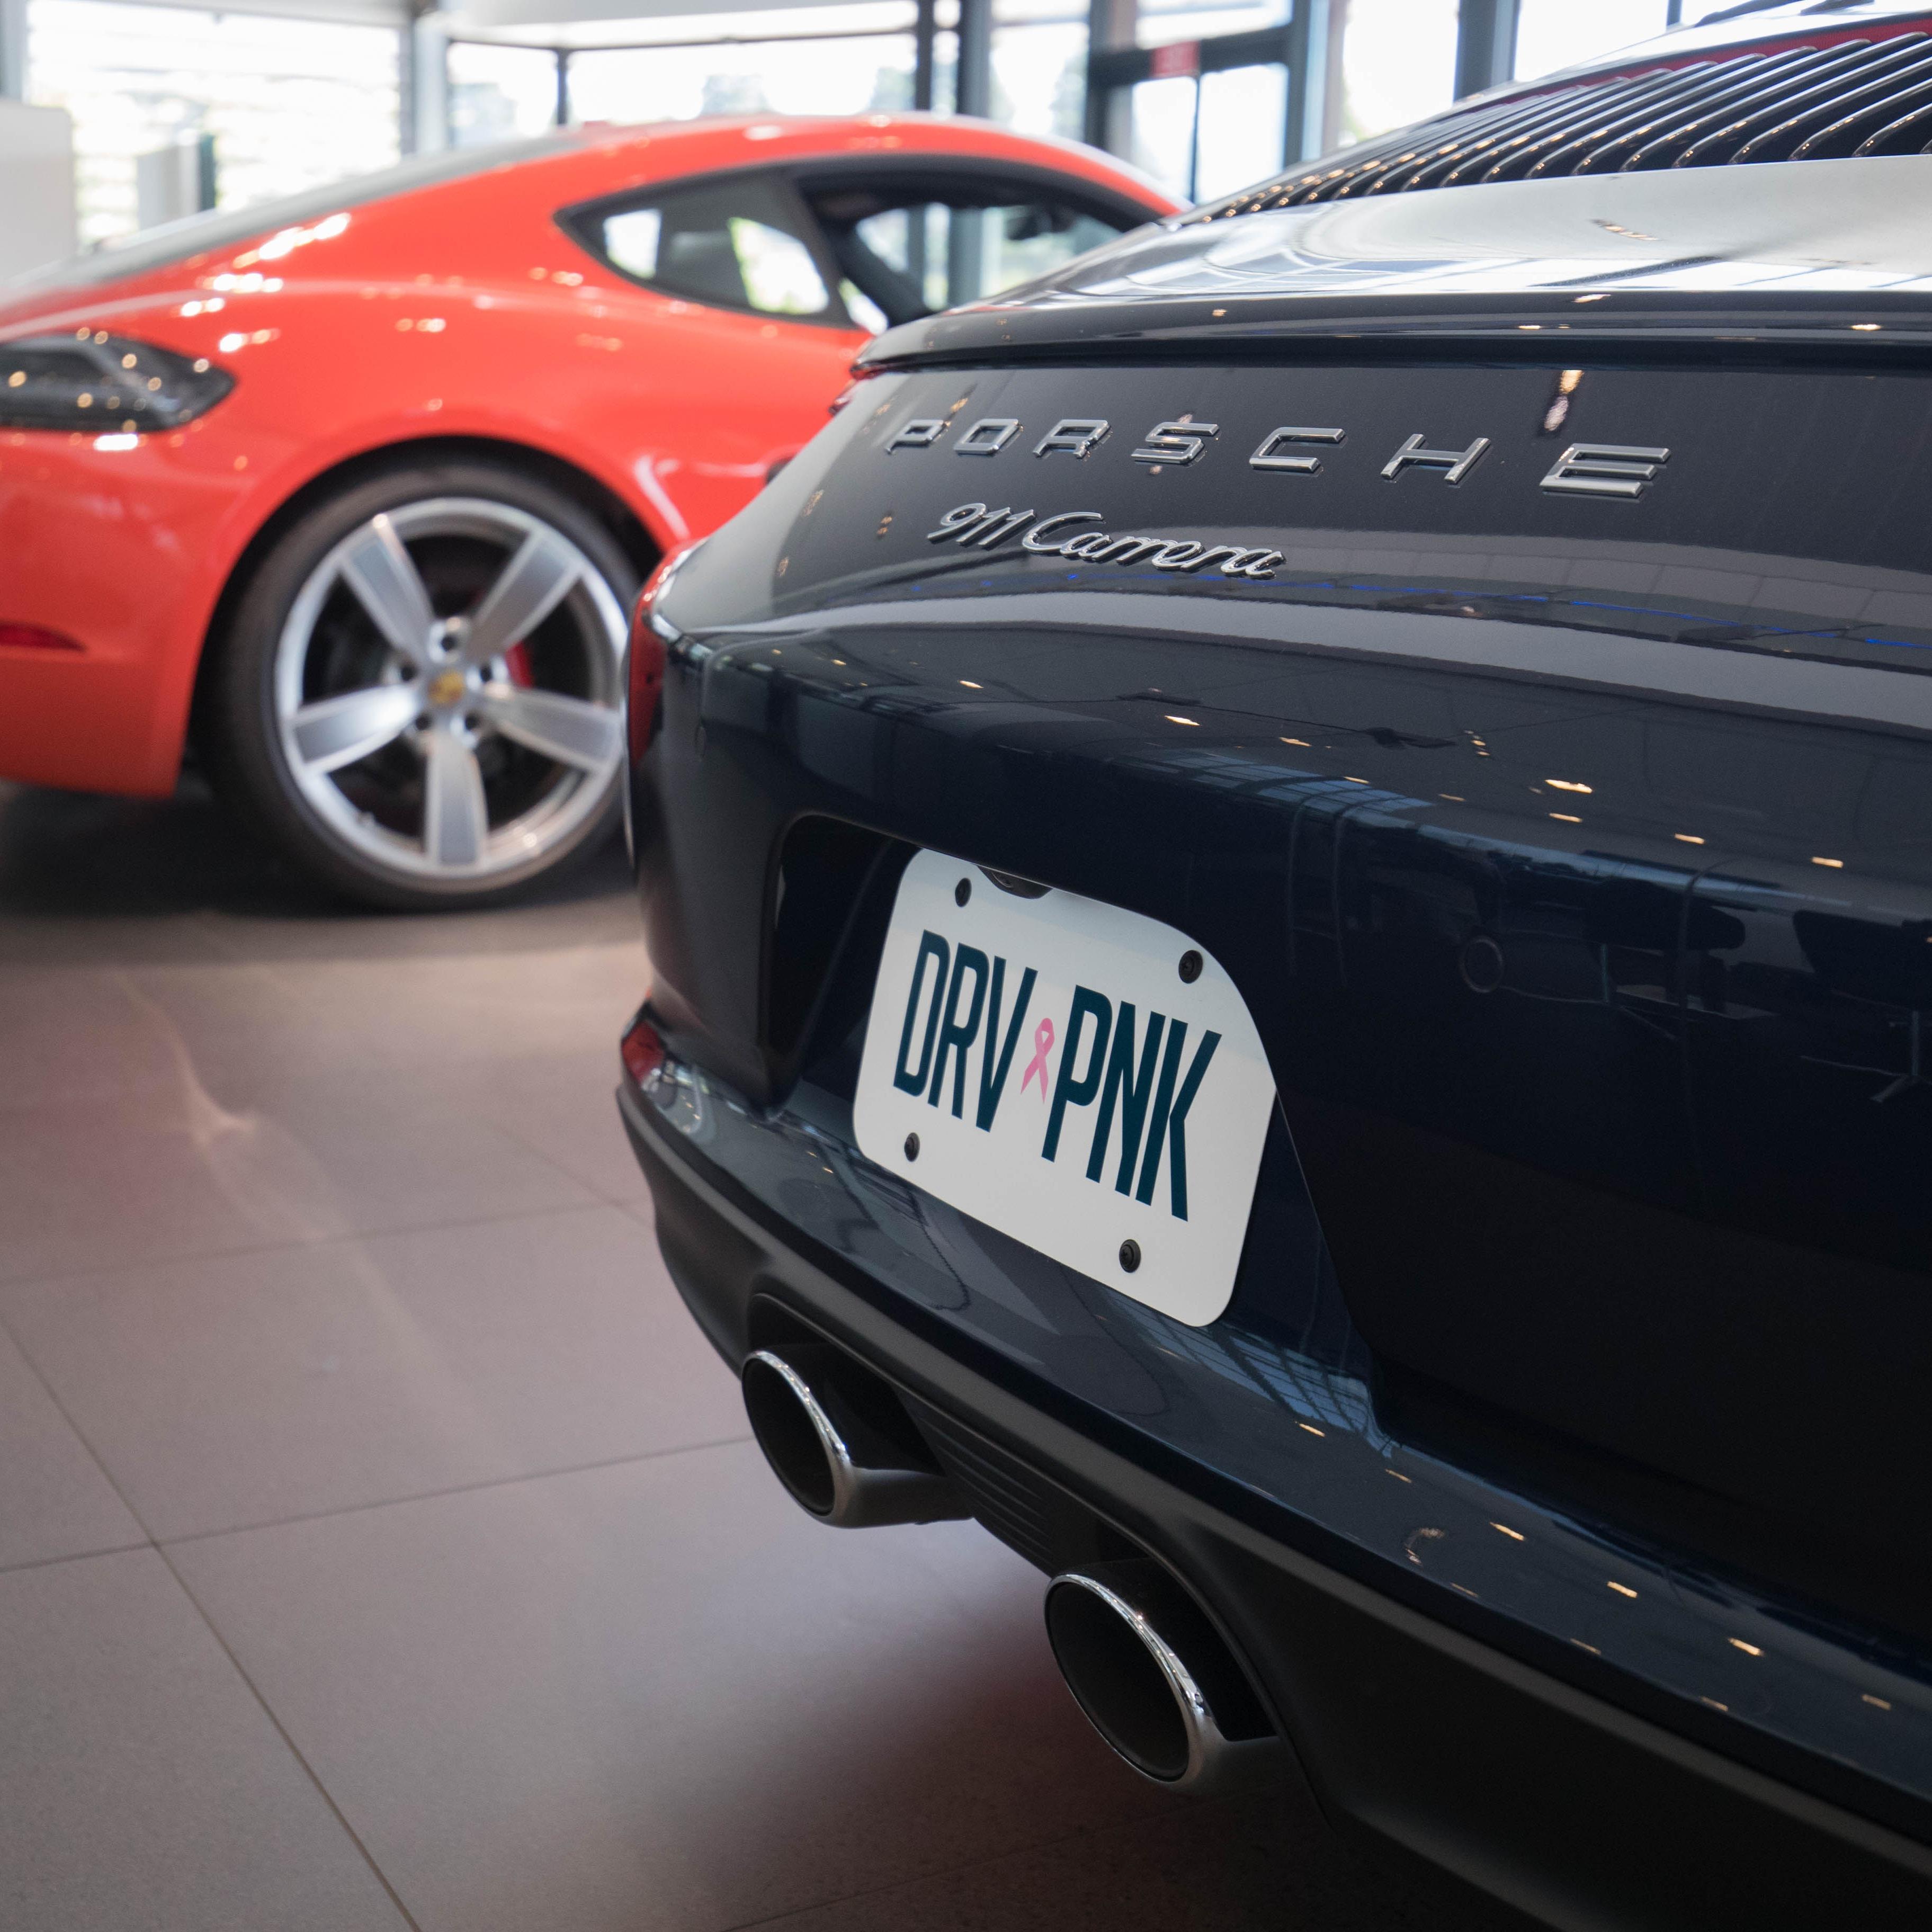 Used Porsche 911 Turbo Near Me: Porsche Bellevue Coupons Near Me In Bellevue